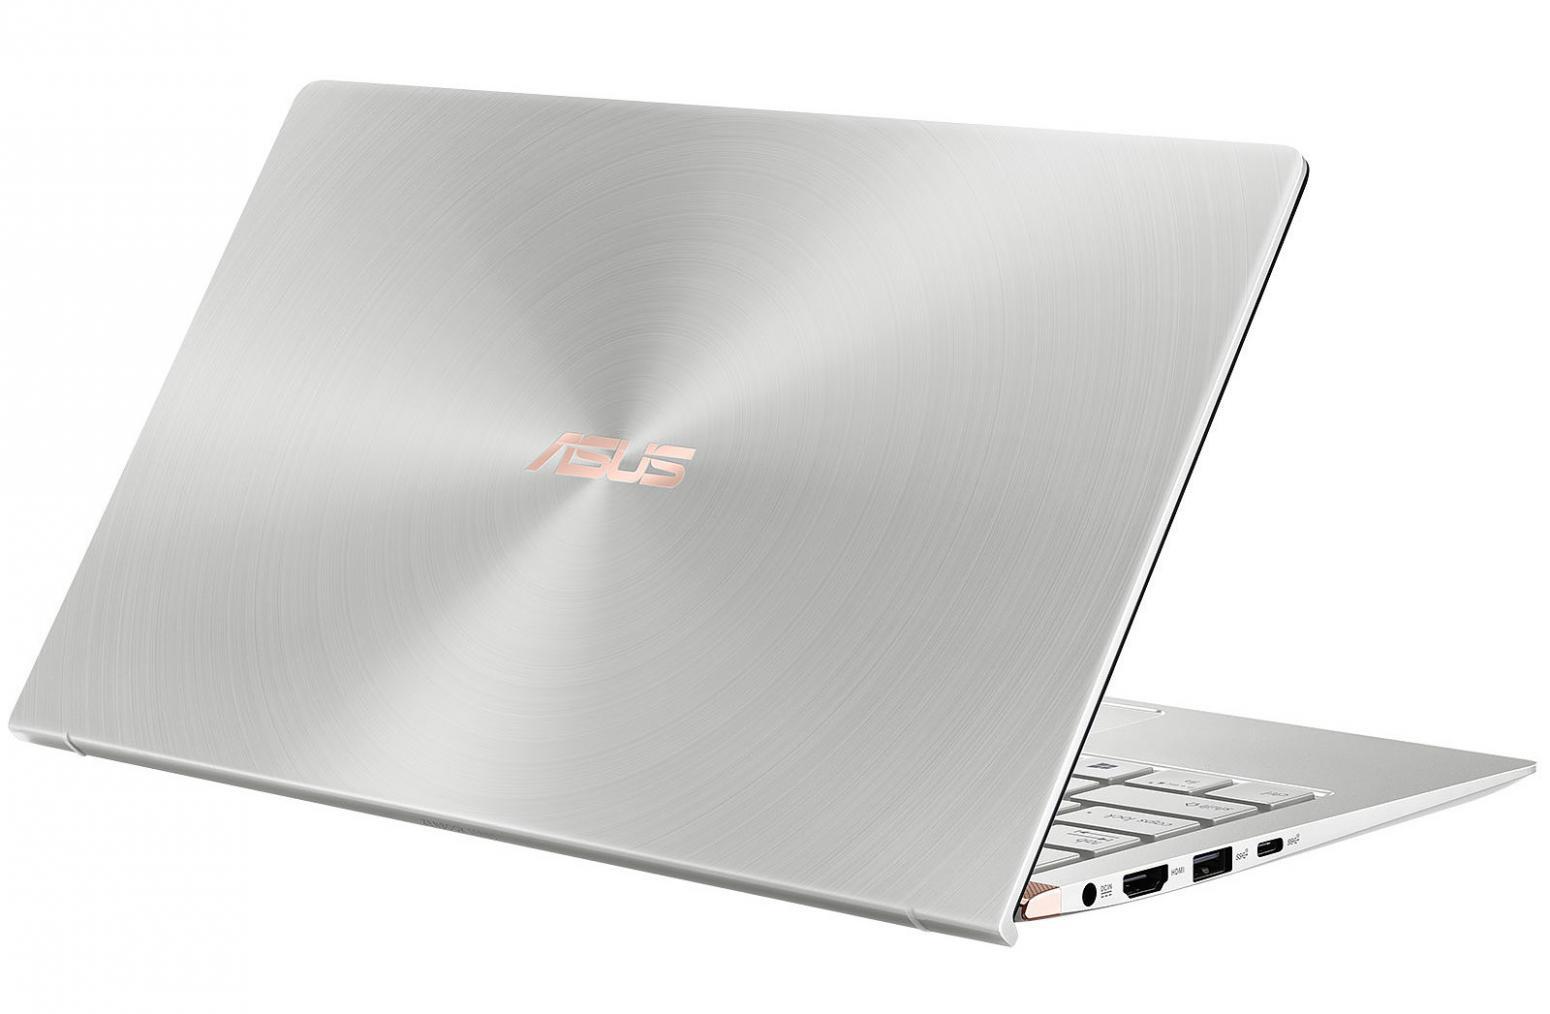 Ordinateur portable Asus Zenbook 13 UX333FA-A3238R Argent - NumPad, Pro - photo 4